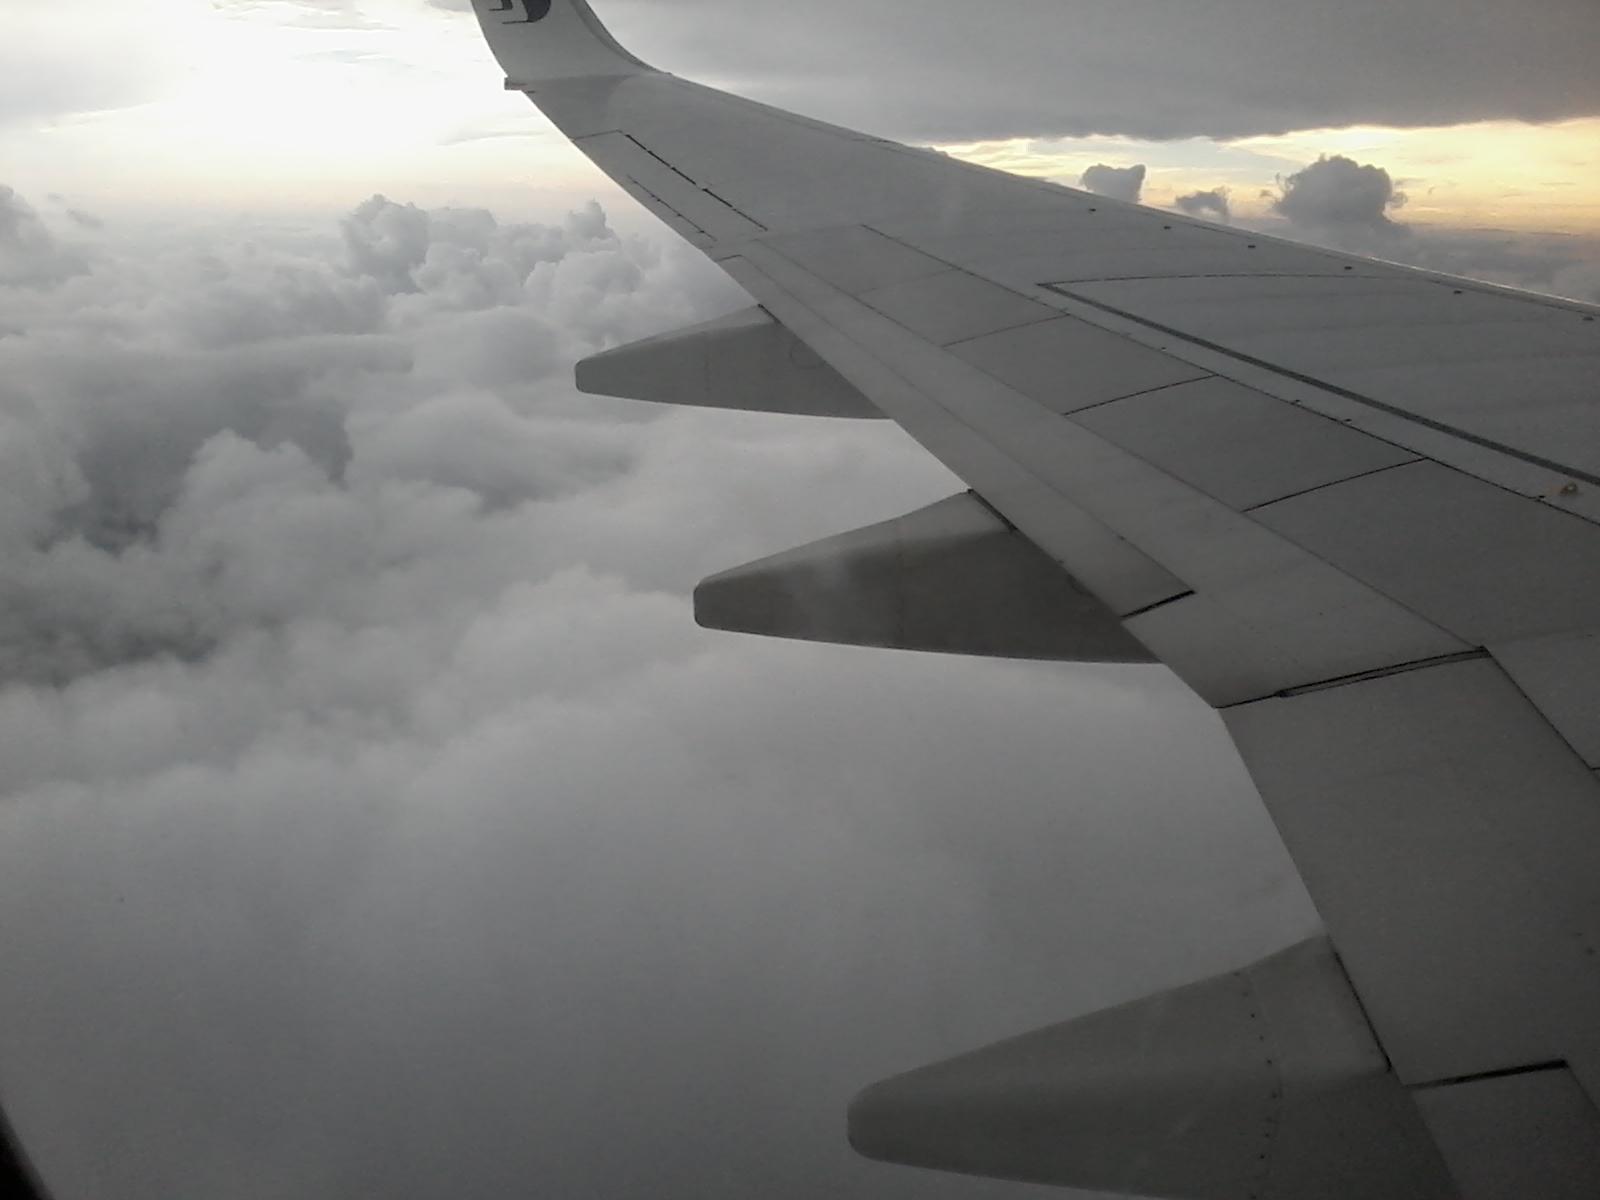 Terbang ke Kota Kinabalu menaiki Malaysia Airlines (MAS)